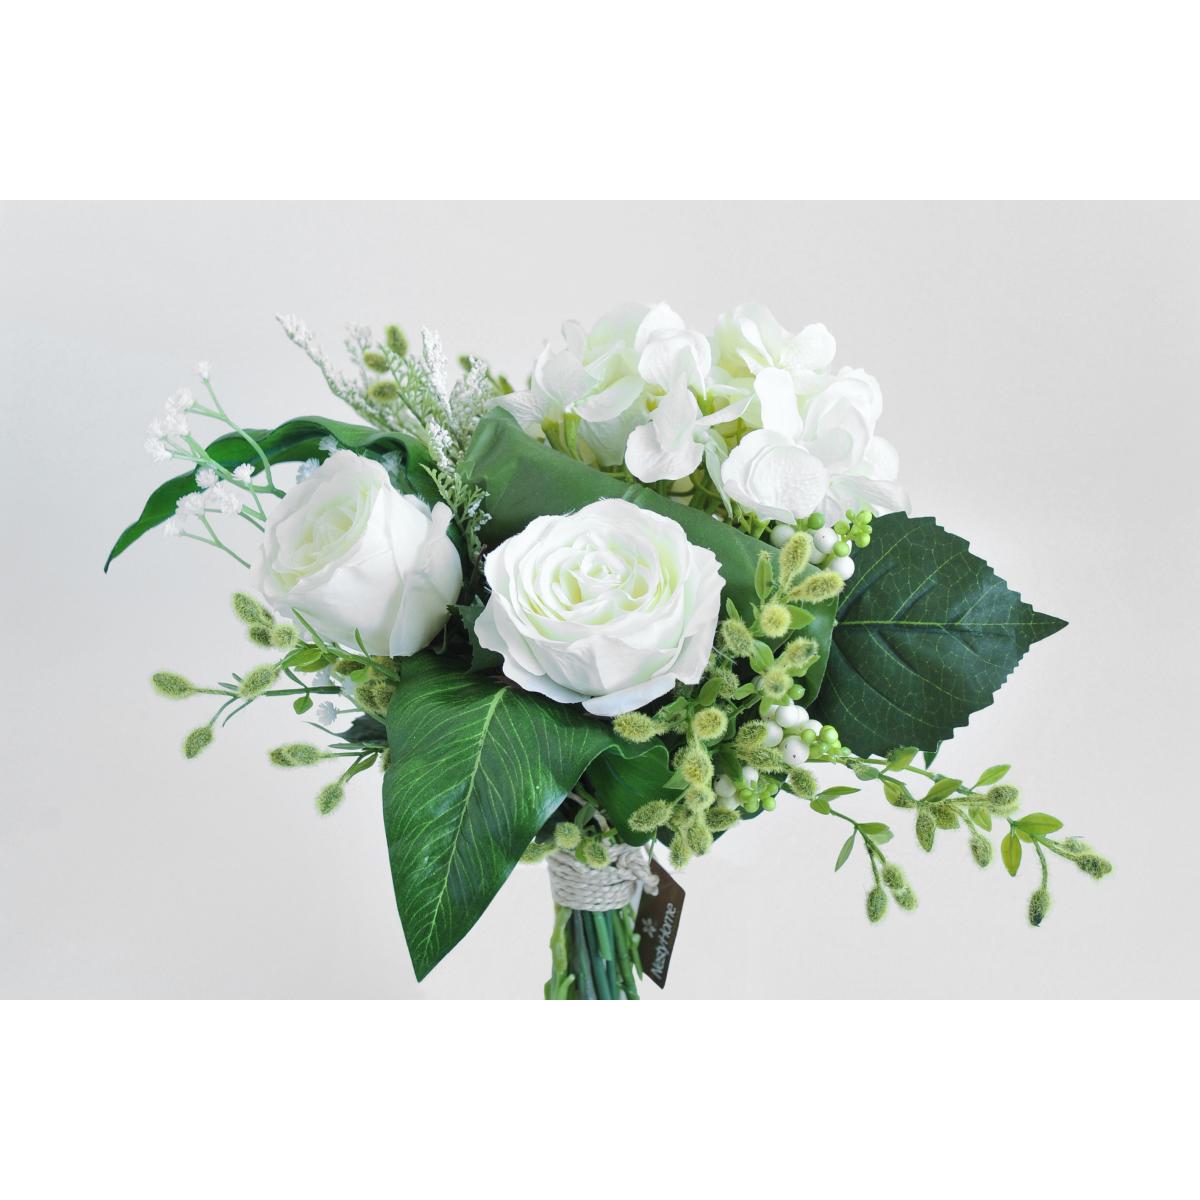 Bouquet Roses Blanches Hortensia Blanc Et Feuillage Vert